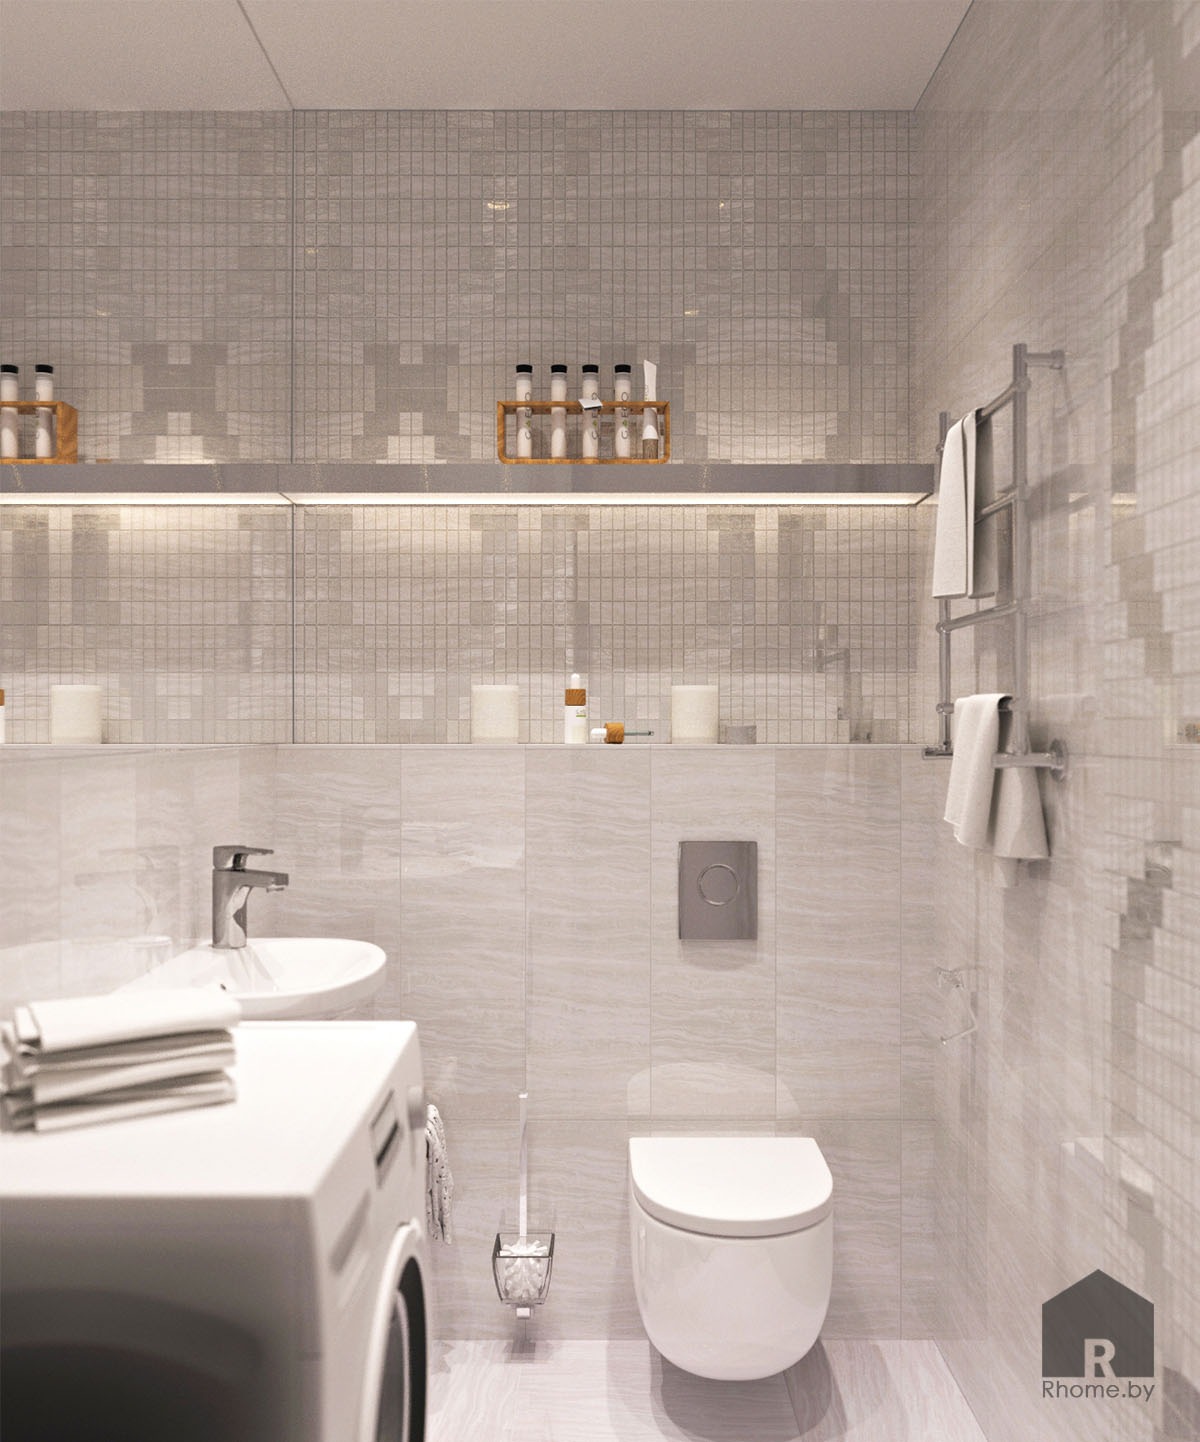 Дизайн интерьера туалета по ул. Белинского | Дизайн студия – Rhome.by